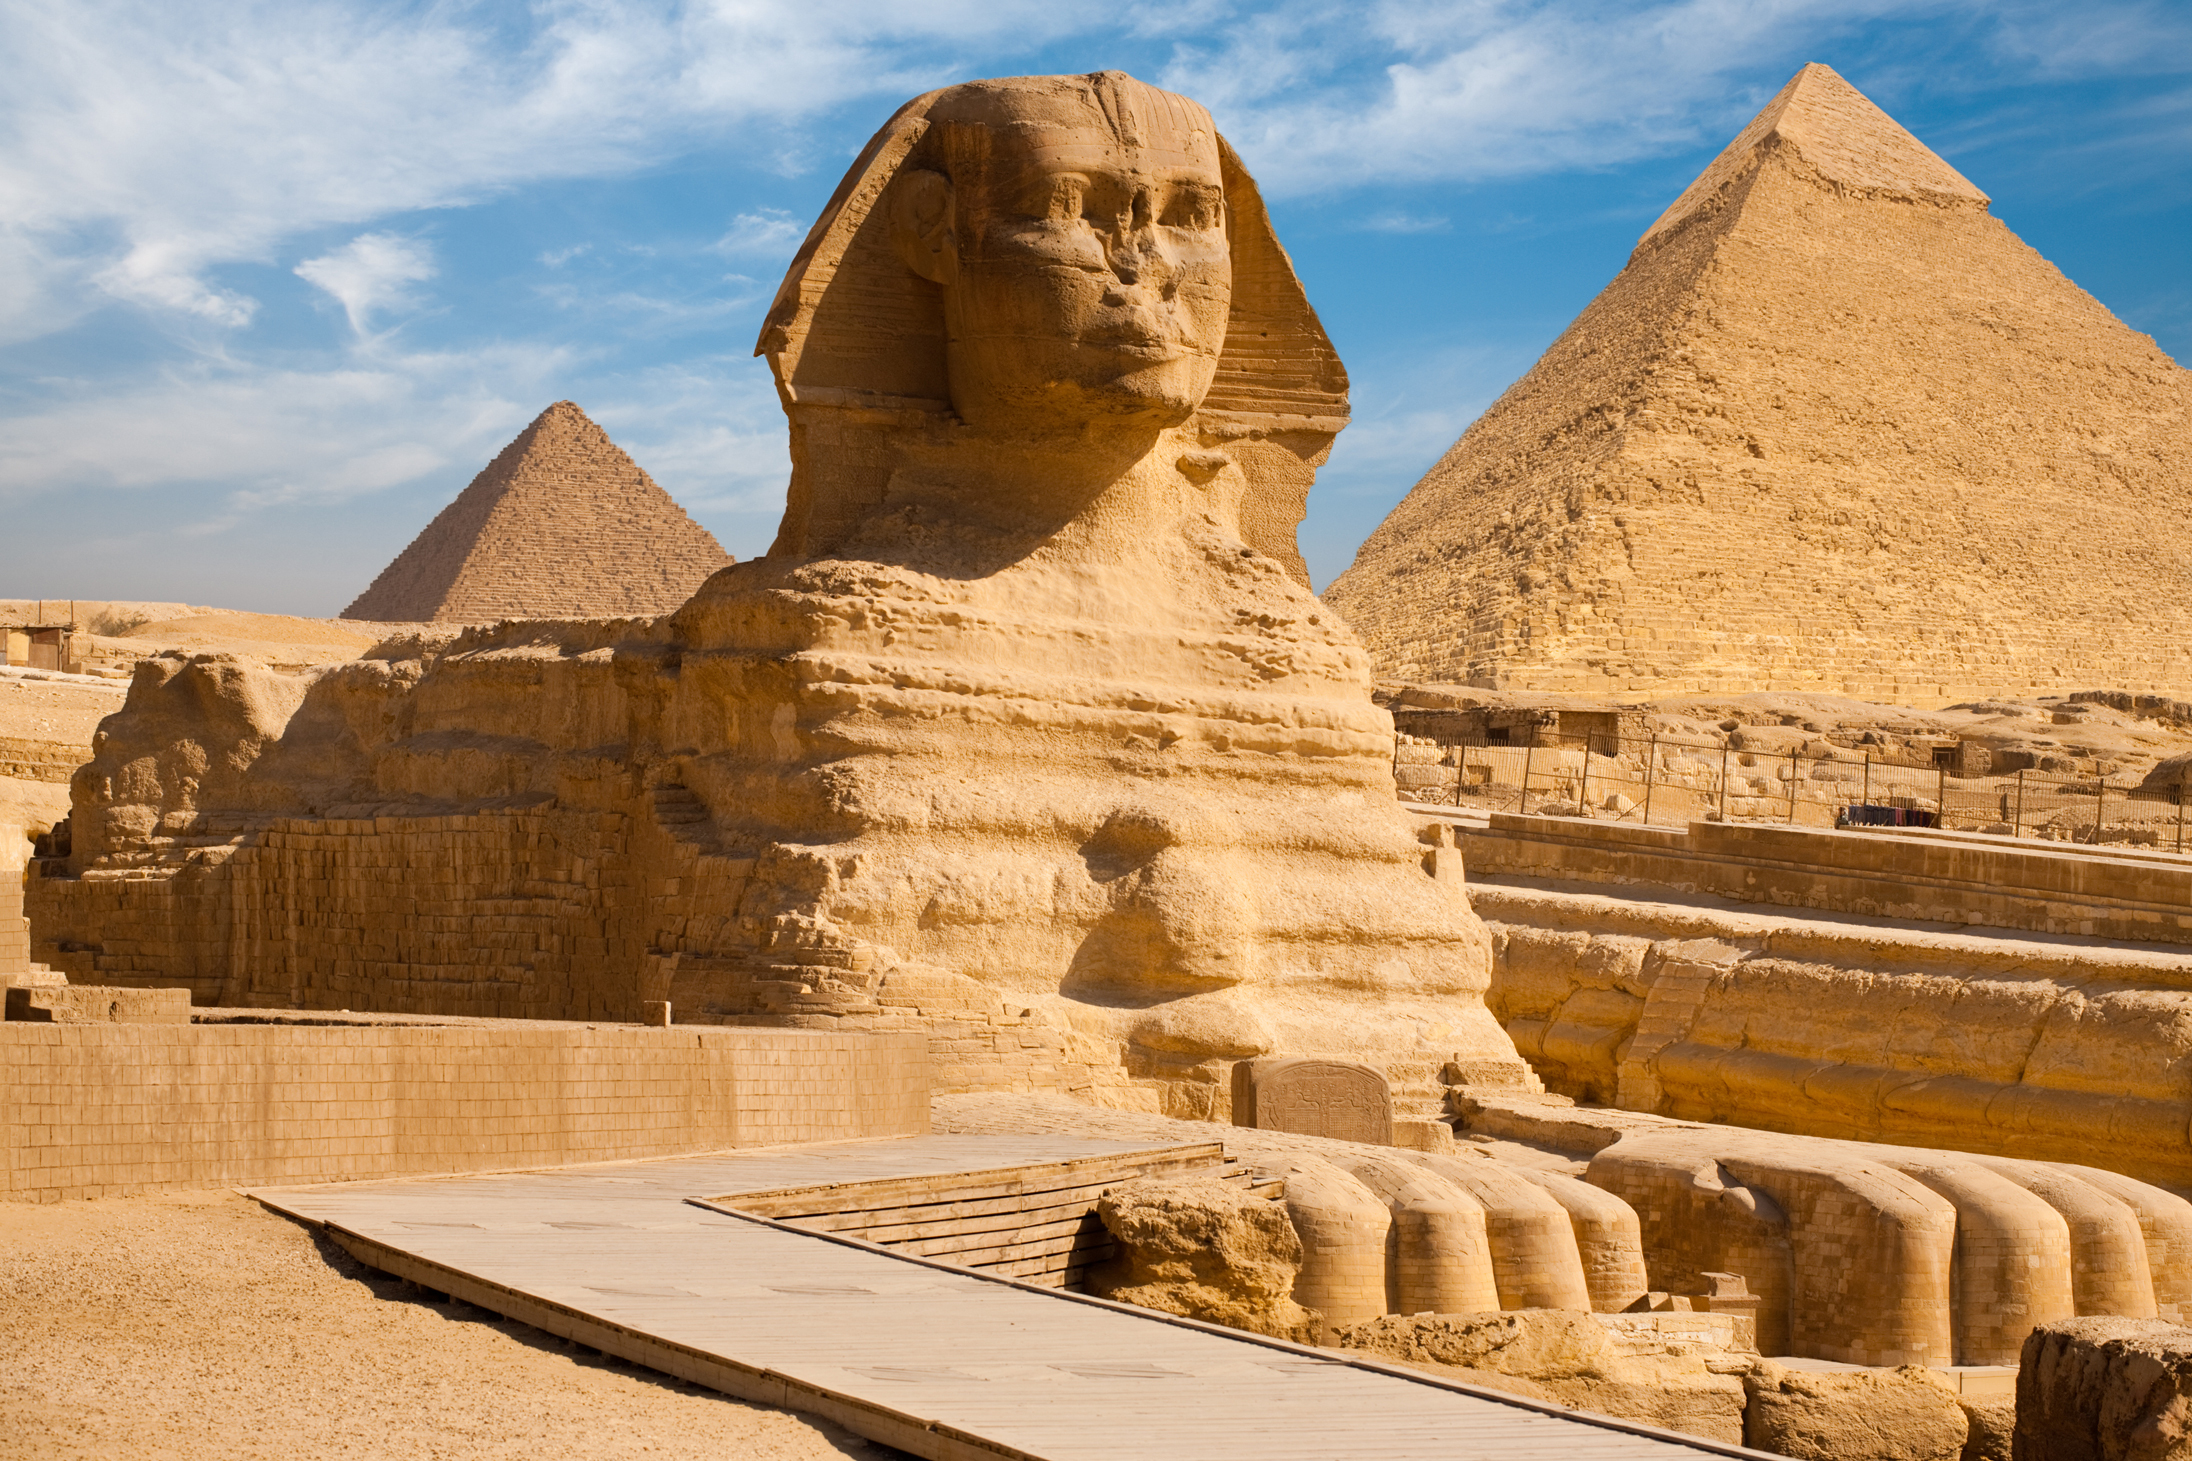 Great Sphinx, Chephren Pyramid, Giza, Egypt  № 2245225 загрузить